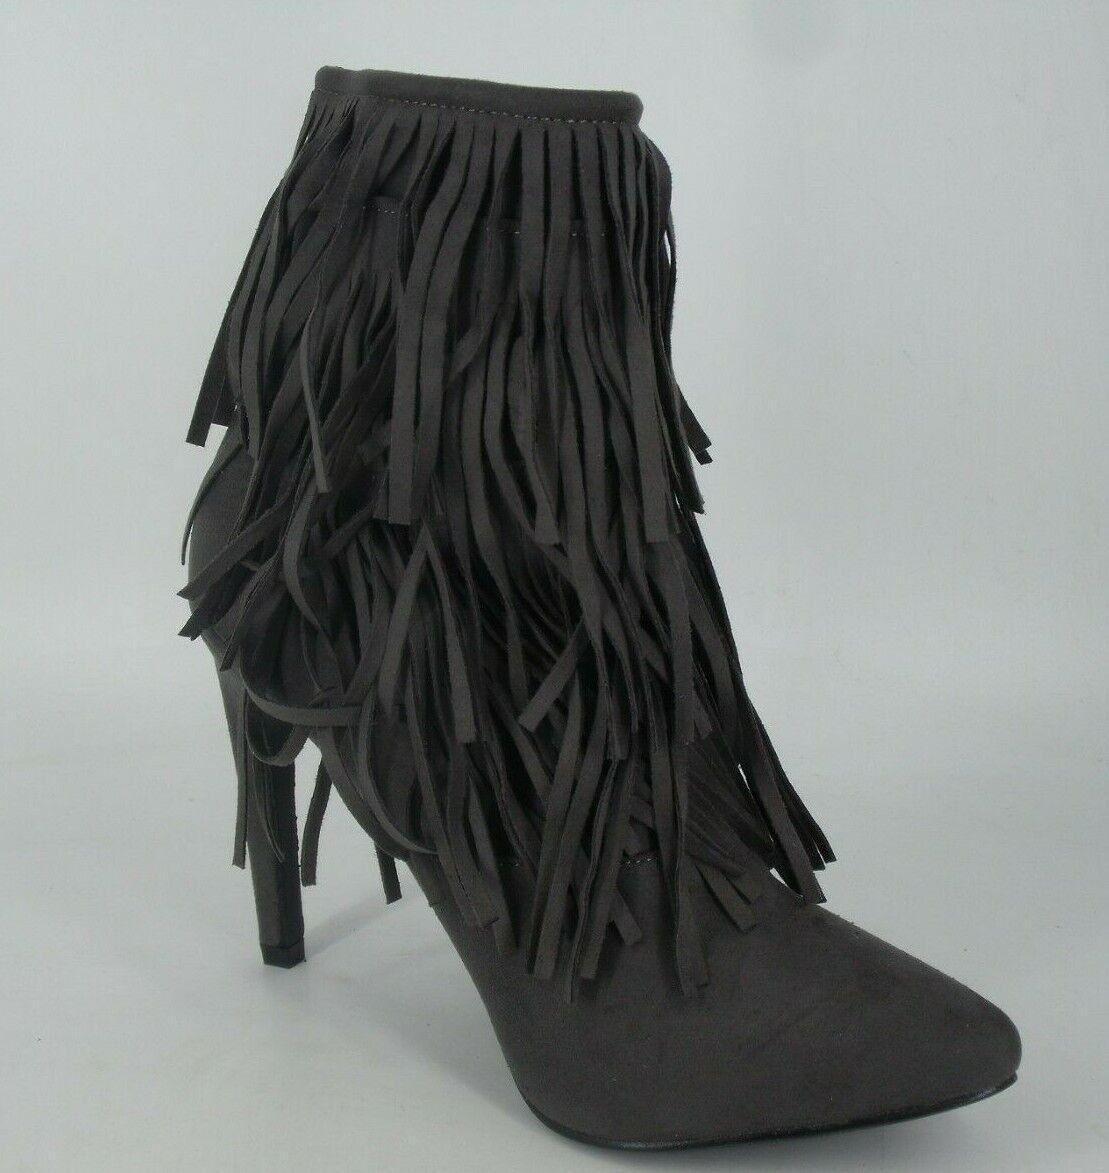 cc1722206a43 Missguided Grey Tassel High Heel Boots UK EU 39 NH092 UU 07 6 Pointed  qcsusb1238-Women s Boots. Ladies Black.